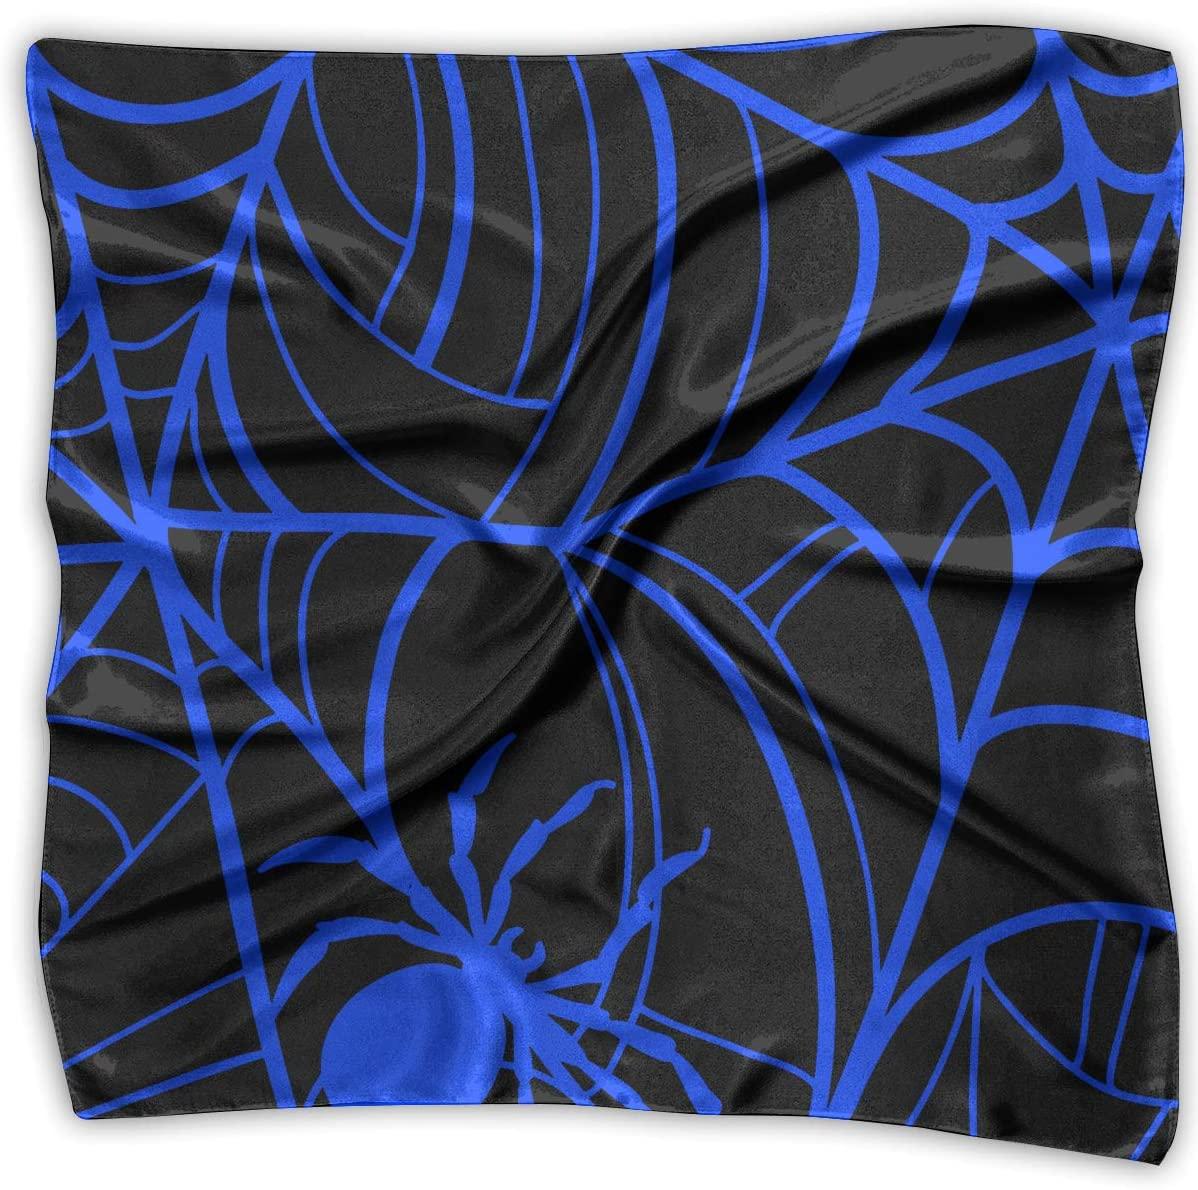 WFIRE Spider Web Glow in The Dark Square Handkerchiefs Scarf Shawl Bandanas Headscarf Neckerchief Tie Hair Scarf